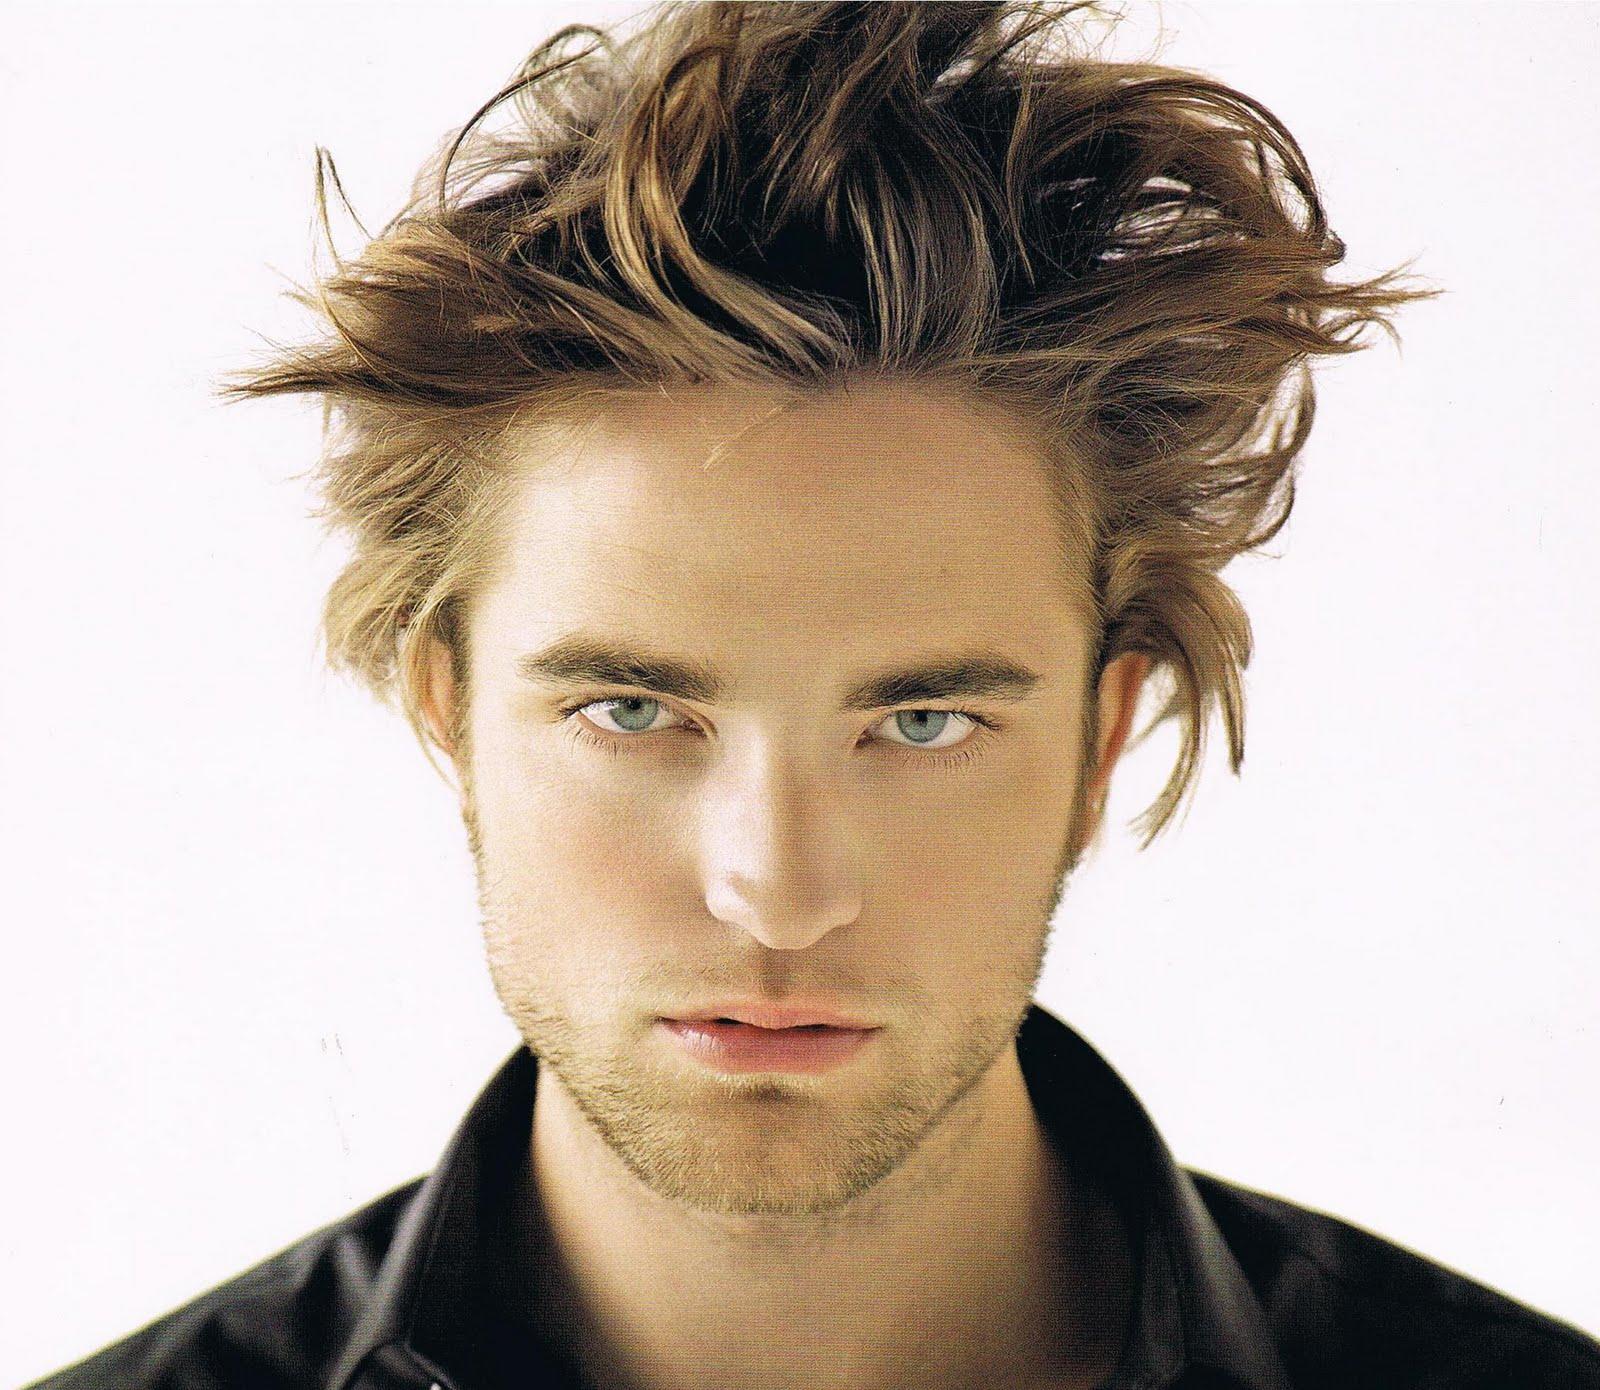 Robert Pattinson: WEIRDLAND: Saying Goodbye To Robert Pattinson's Sex Hair